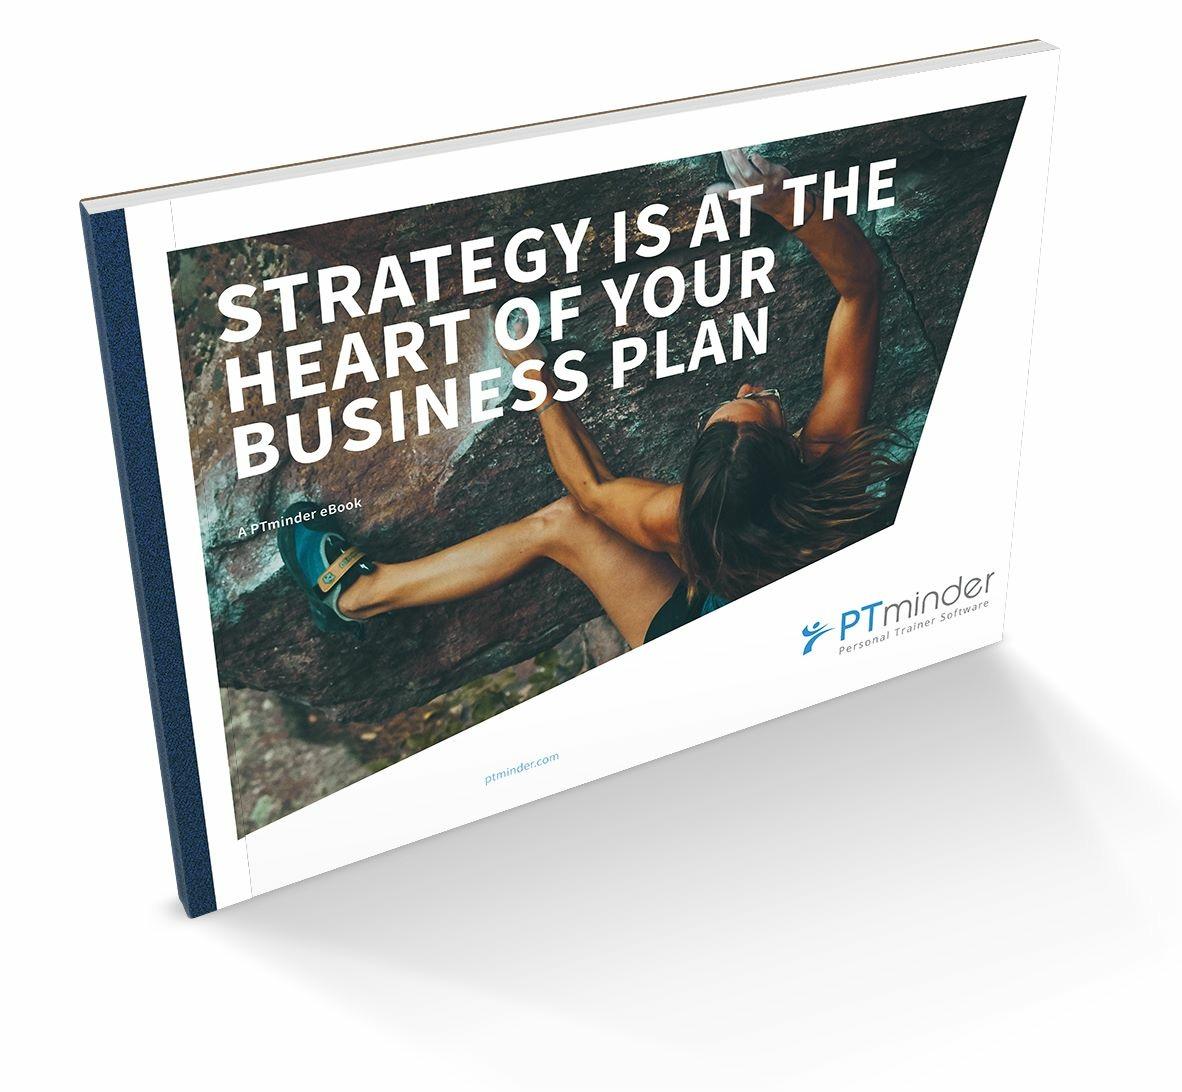 Business Plan - Your Blueprint for Success